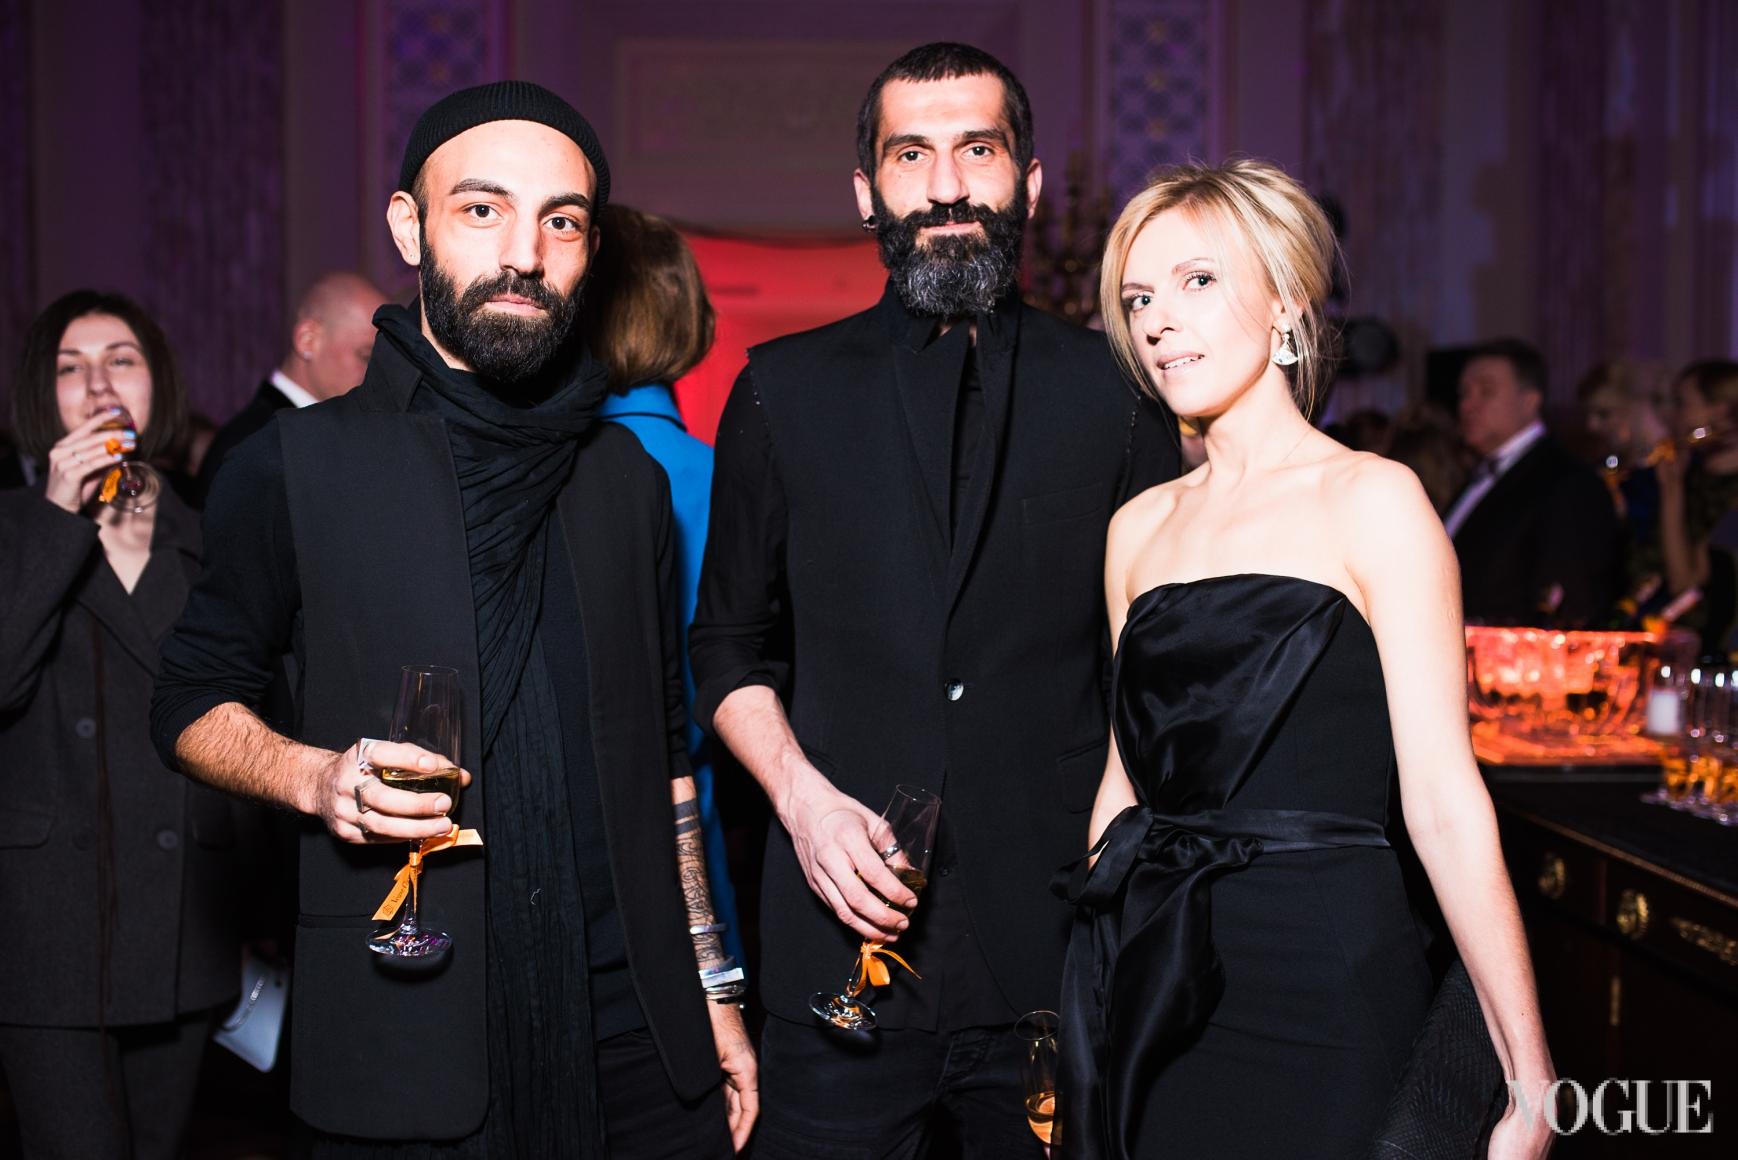 Лаша Мдинарадзе, Валерий Топал и Юлия Костецкая